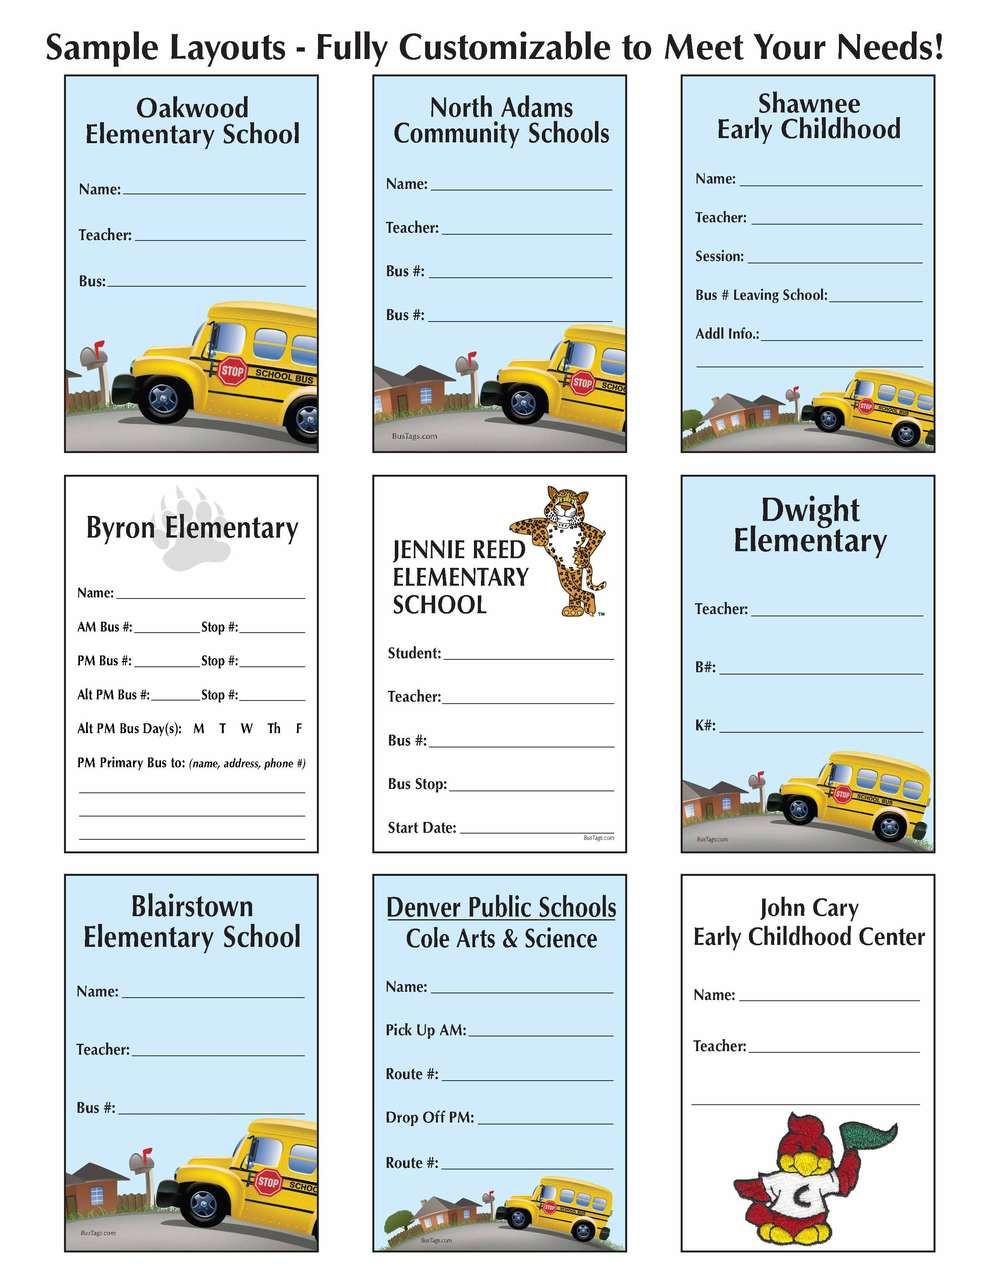 Student Bus Tag ID (446) Sample Sheet